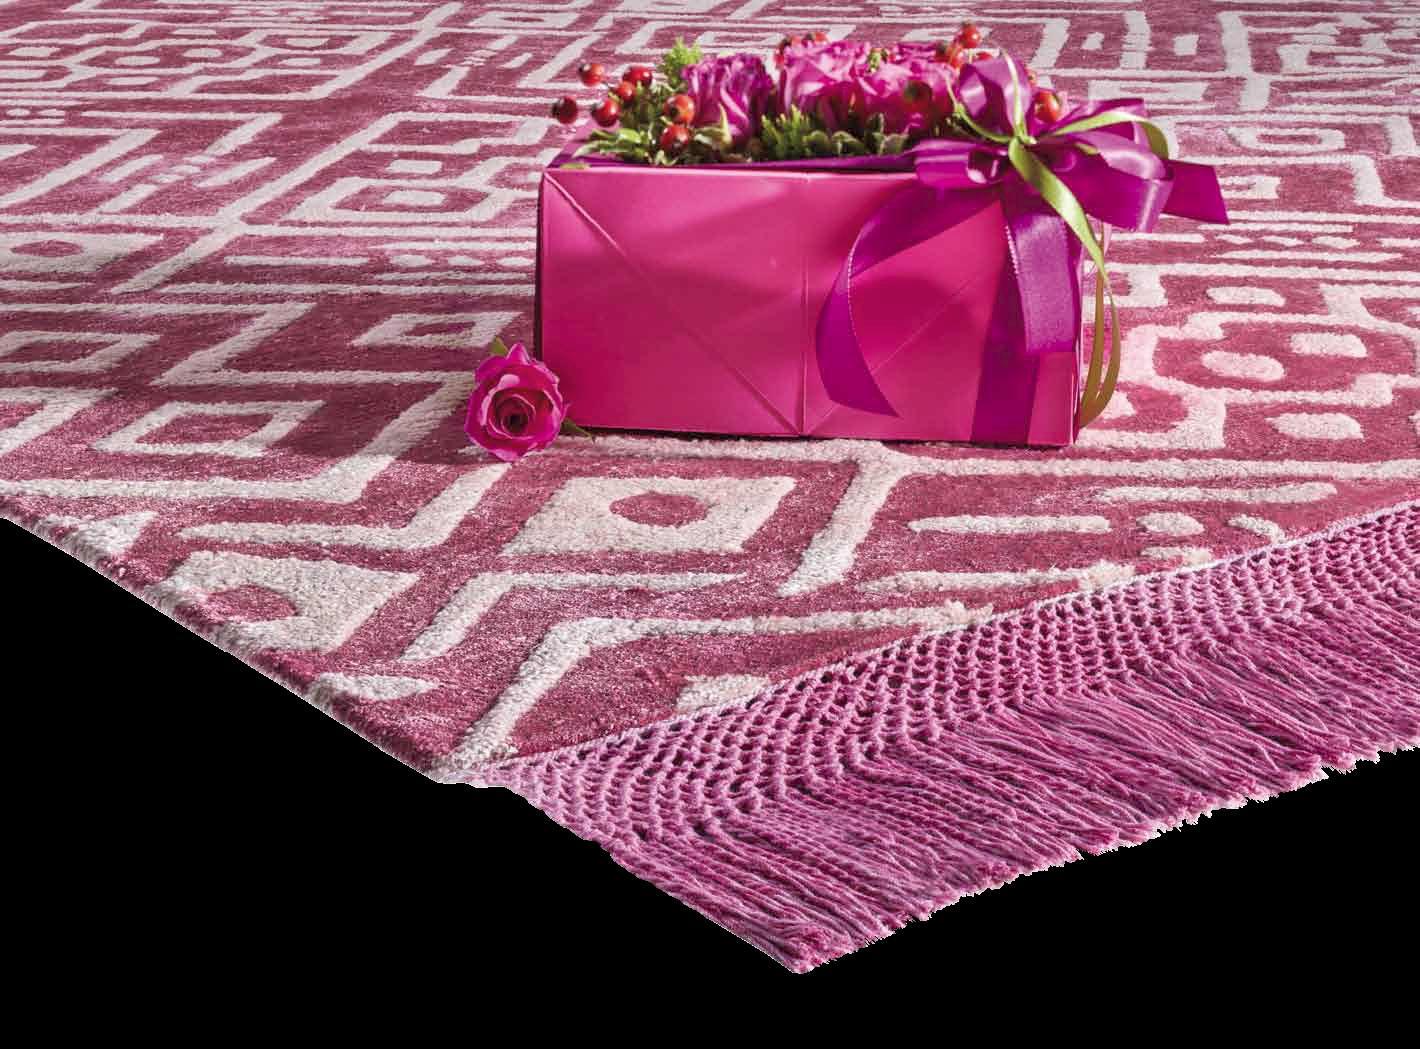 Hippy tapis contemporain achat en ligne italy dream design - Tapis bambou grande taille ...